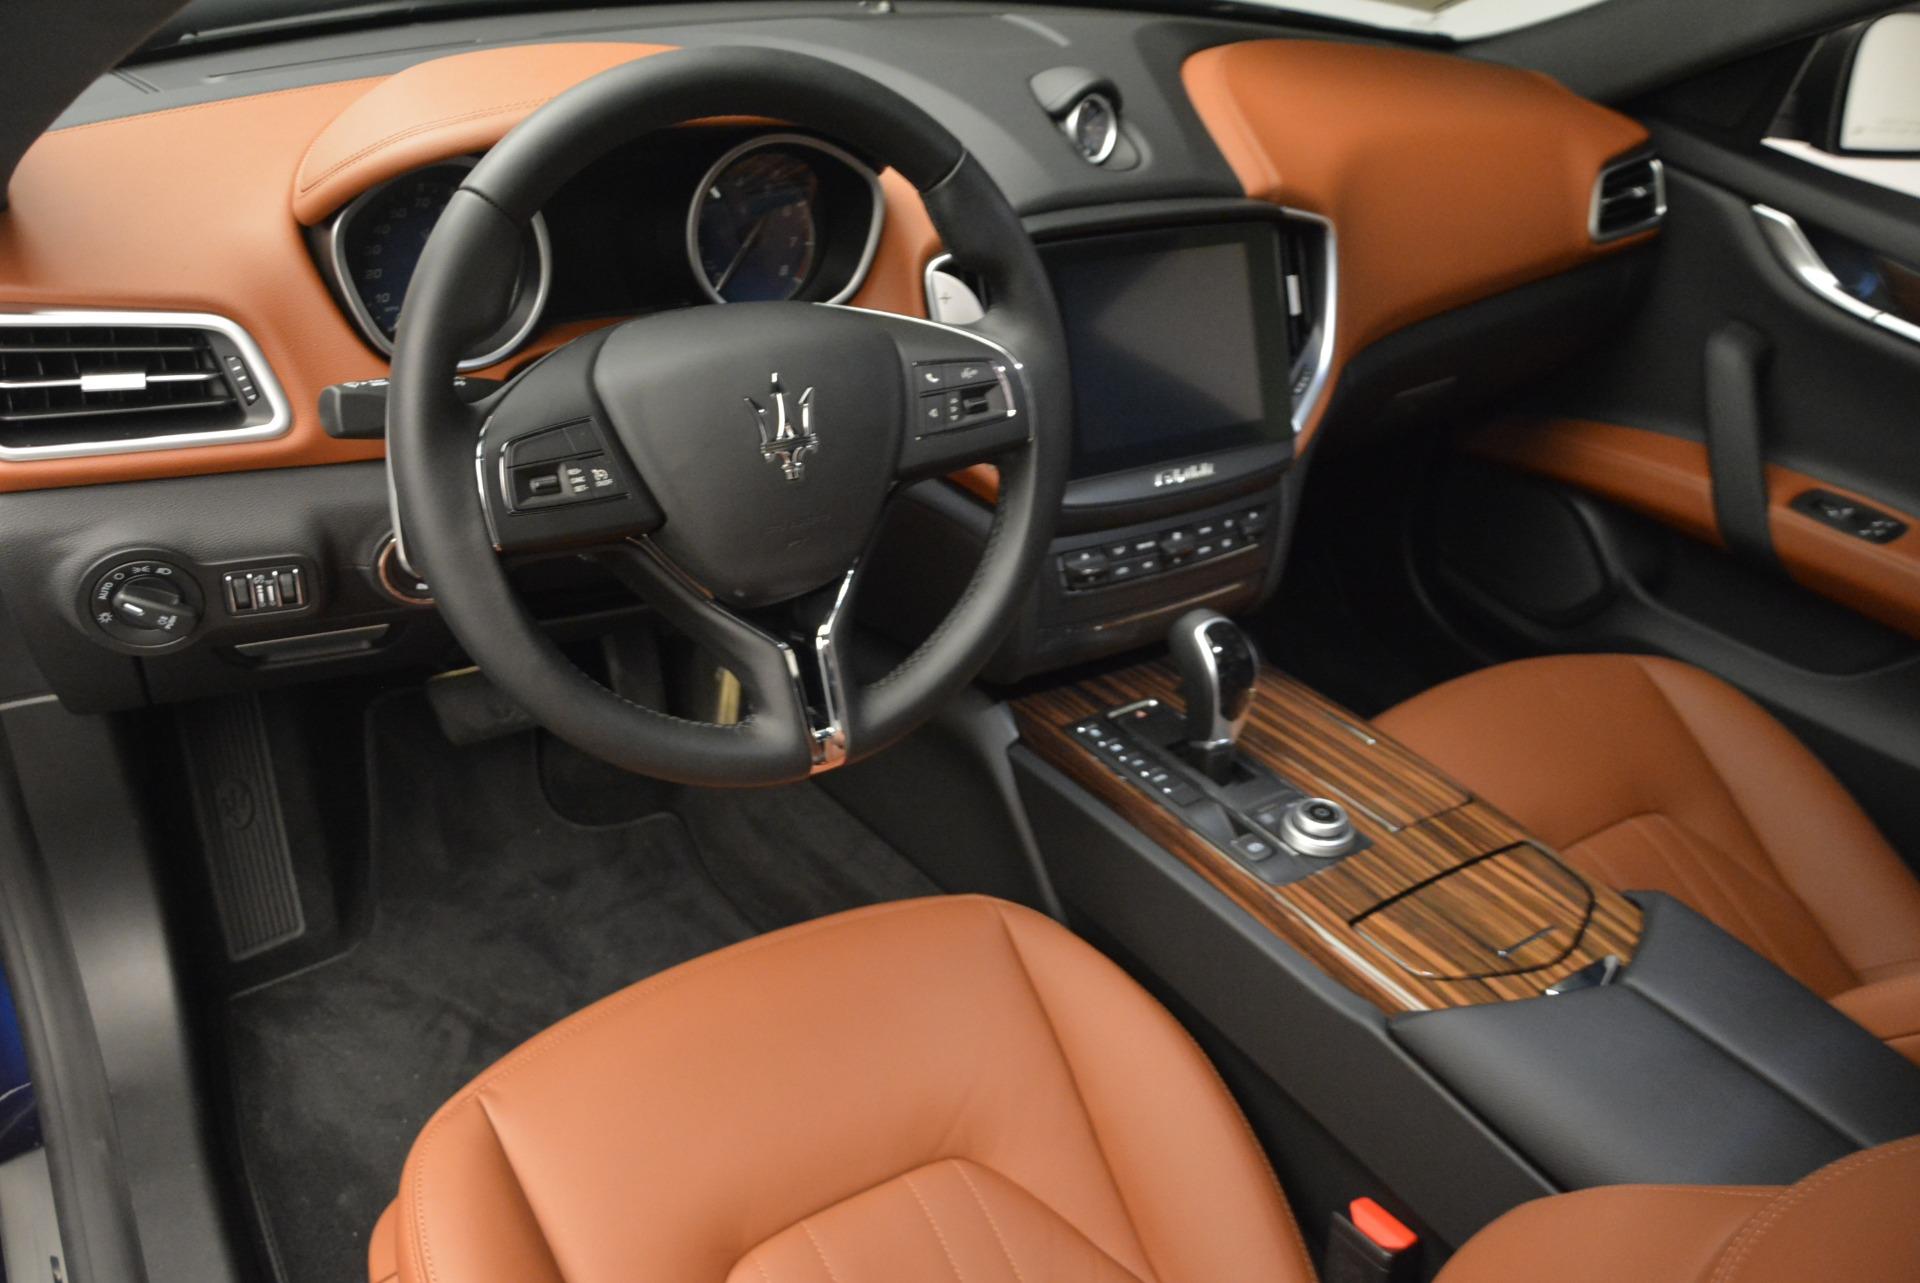 Used 2017 Maserati Ghibli S Q4 Ex-Loaner For Sale In Greenwich, CT 719_p16